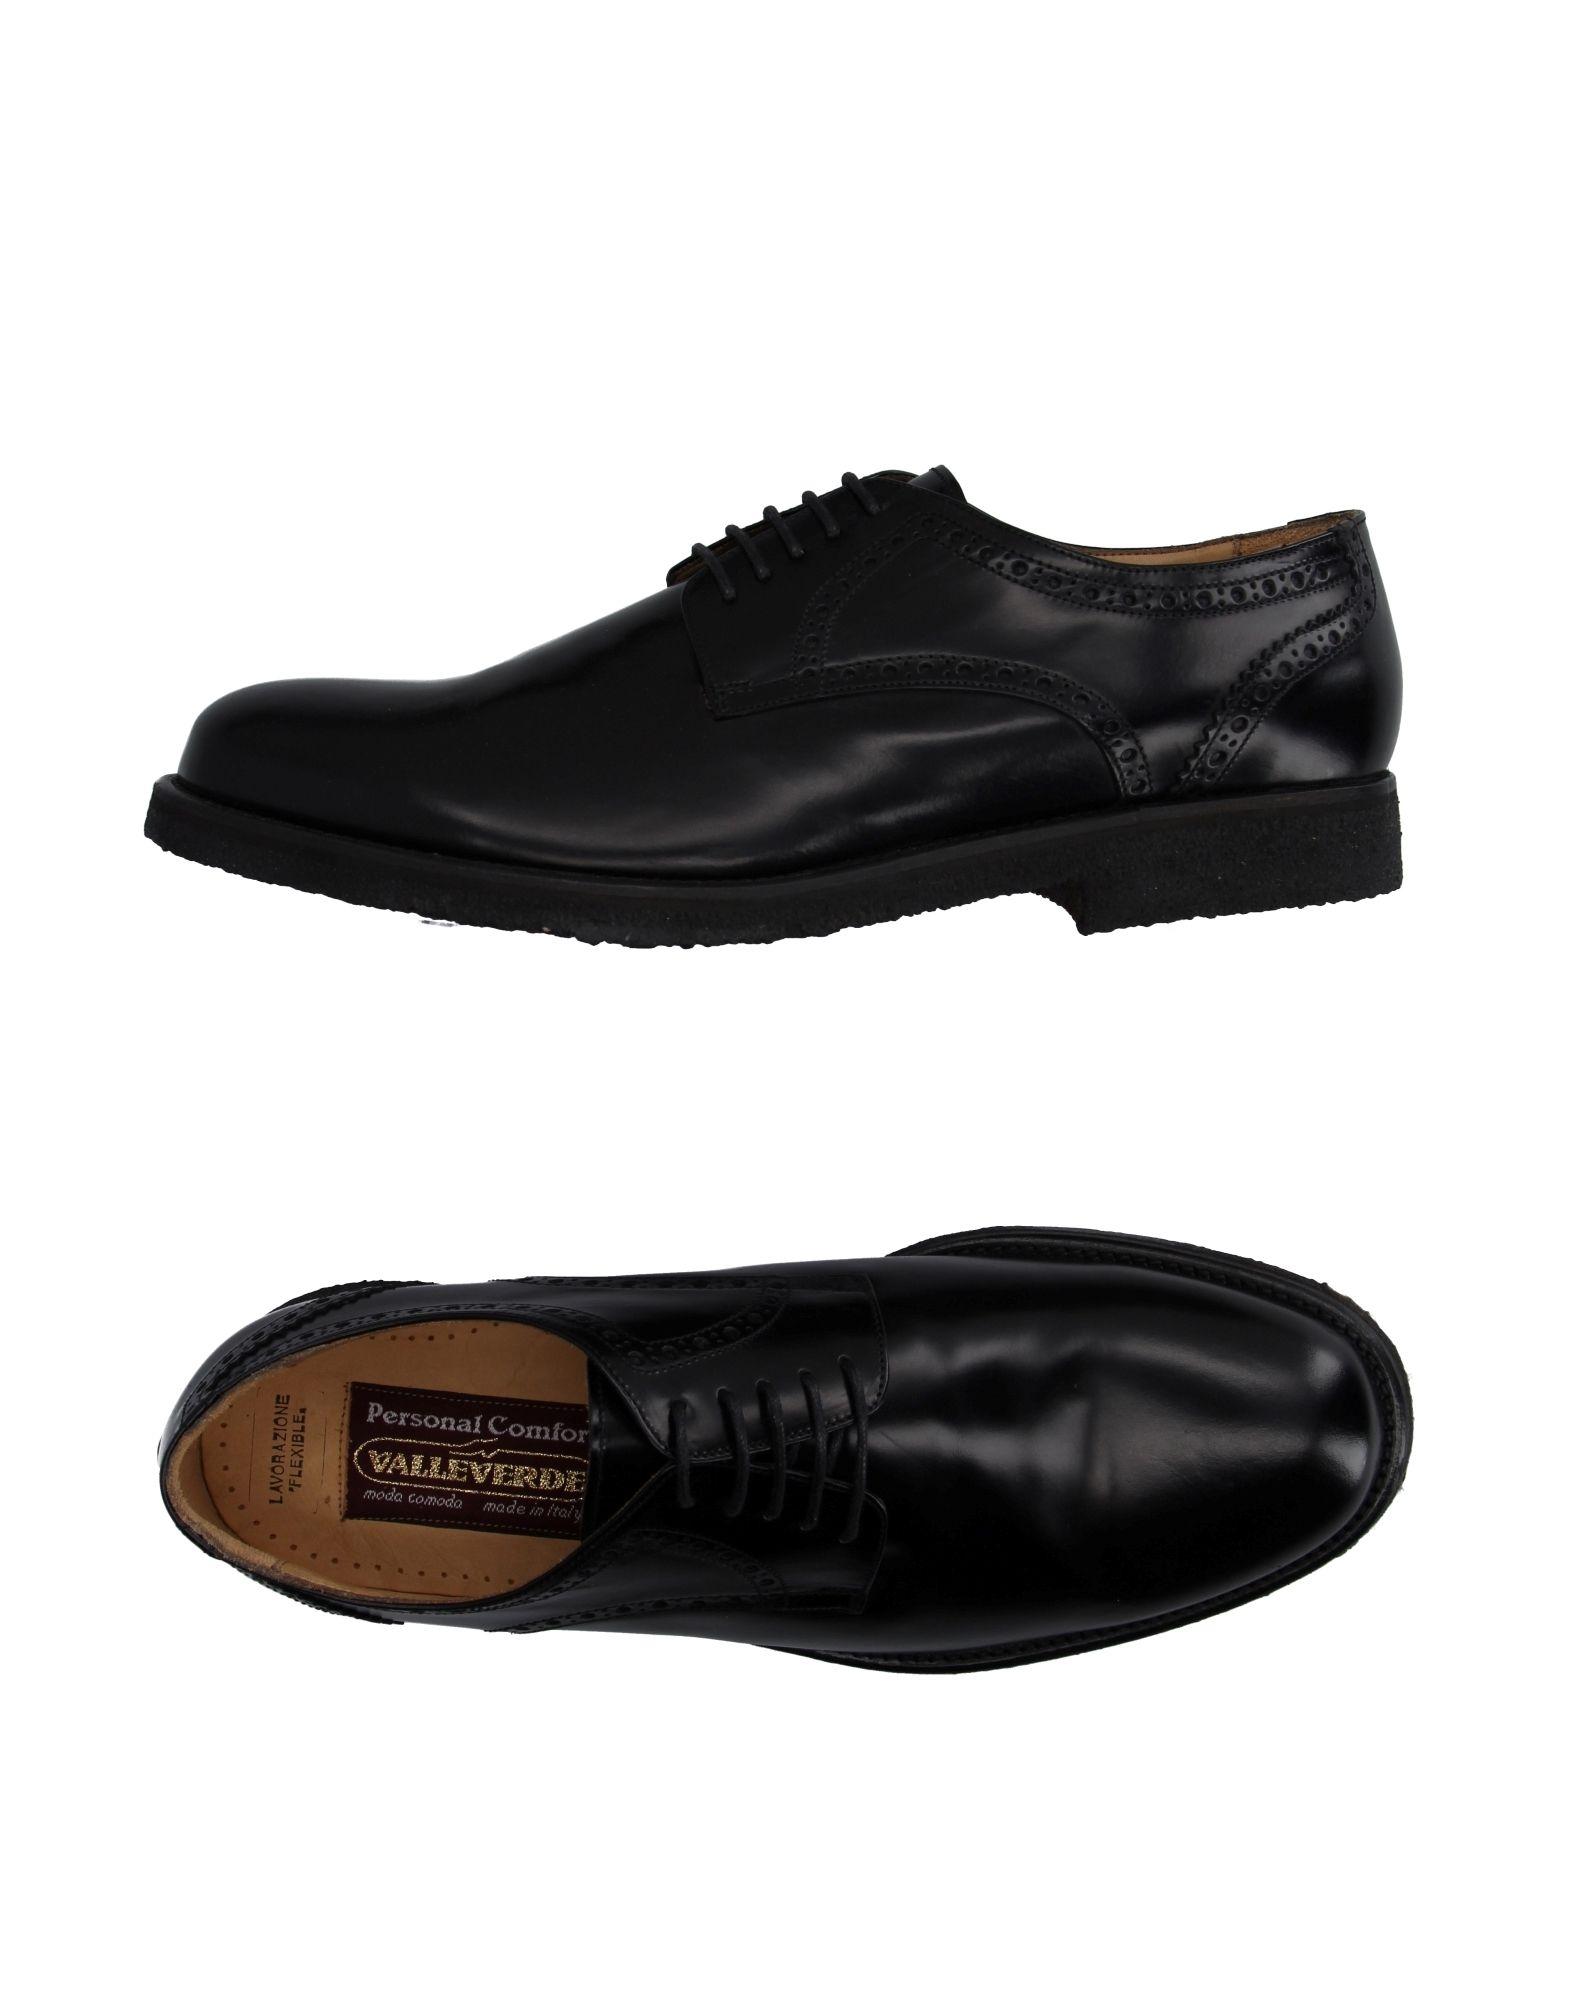 Rabatt echte Schuhe Valleverde Schnürschuhe Herren  11086315QV